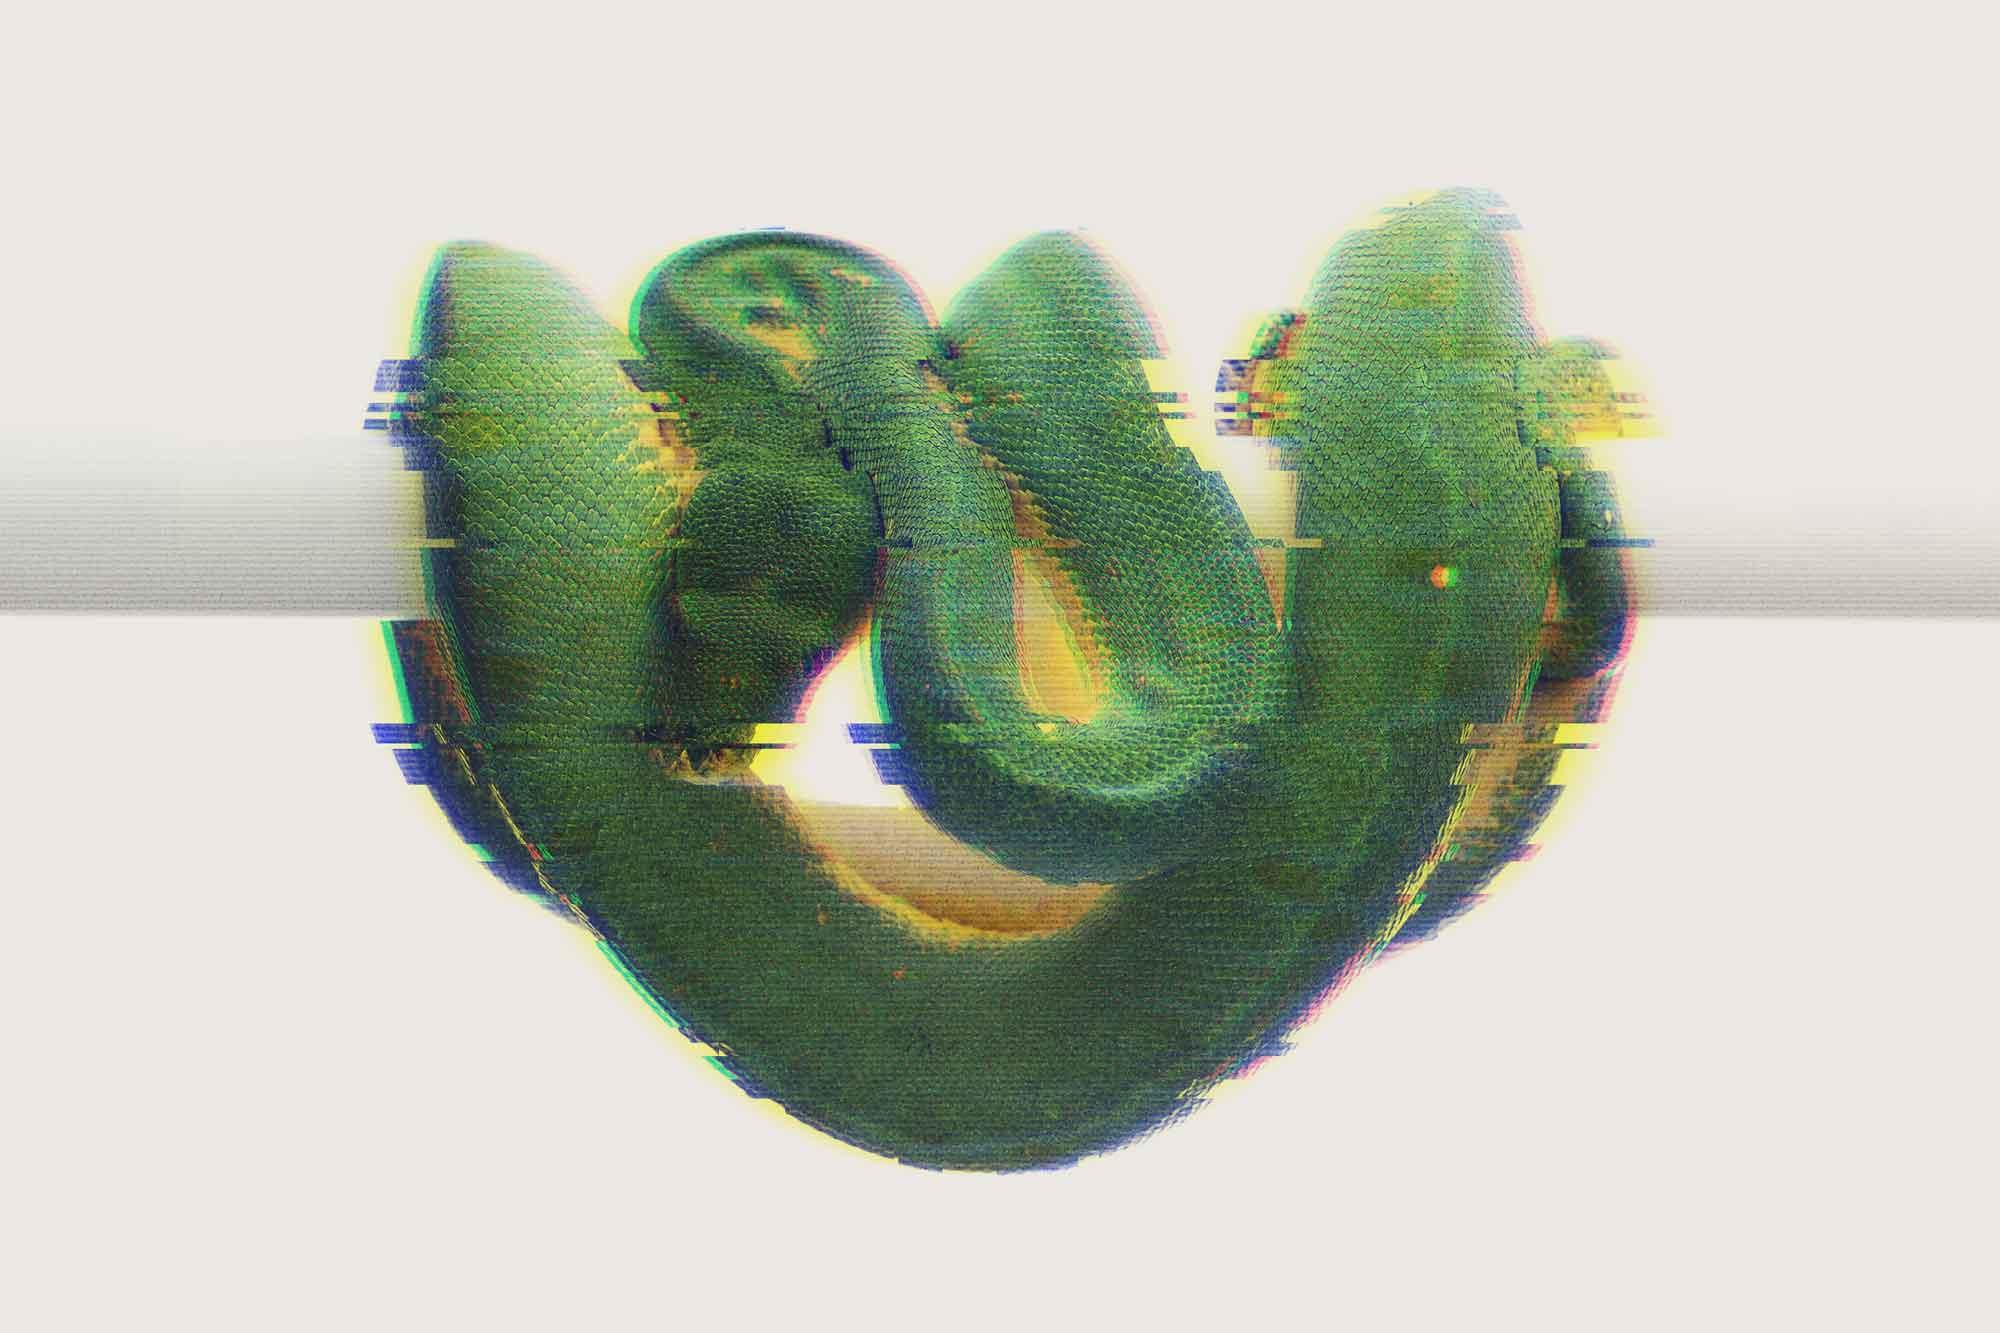 Python Data Visualization @ Deepnote (w/ PyViz overview)